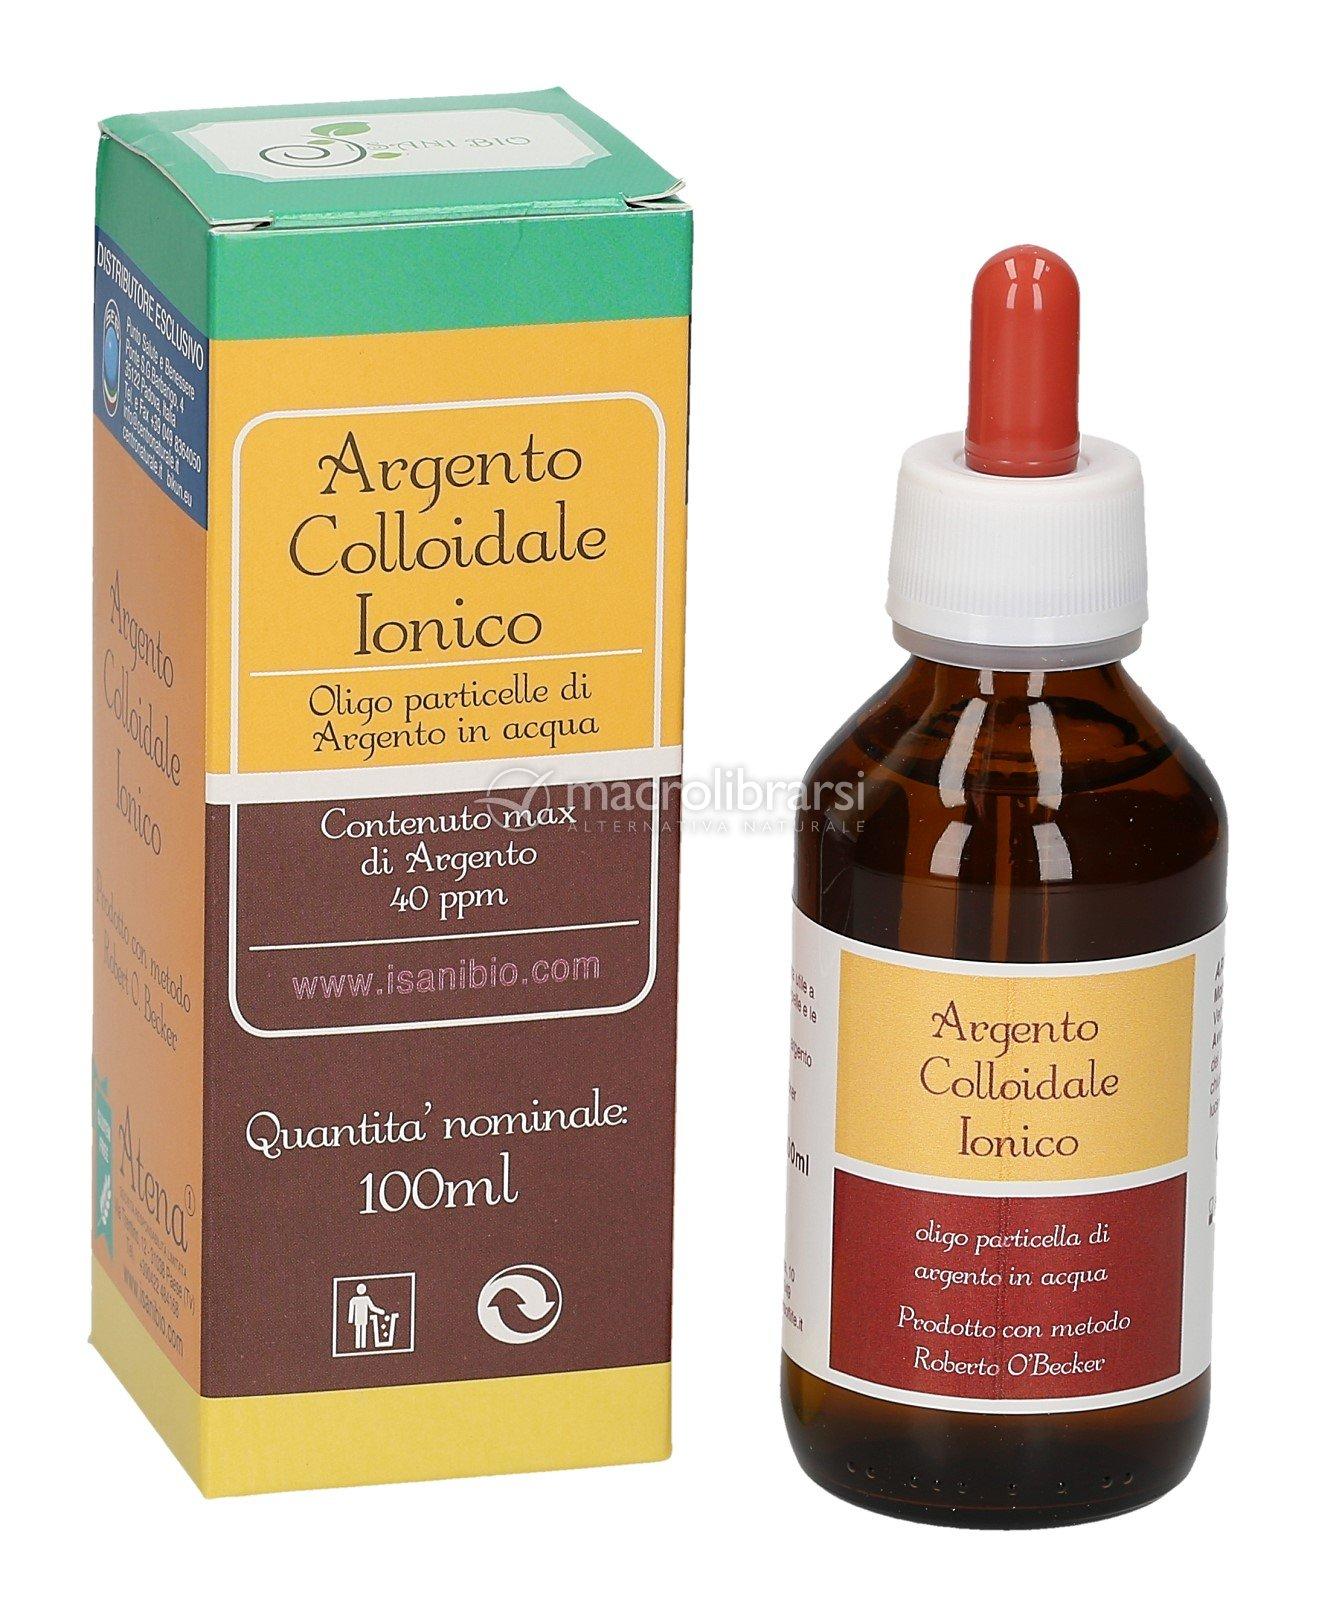 argento colloidale  Argento Colloidale Ionico - 40 ppm - 100 ml - ATENA S.R.l.